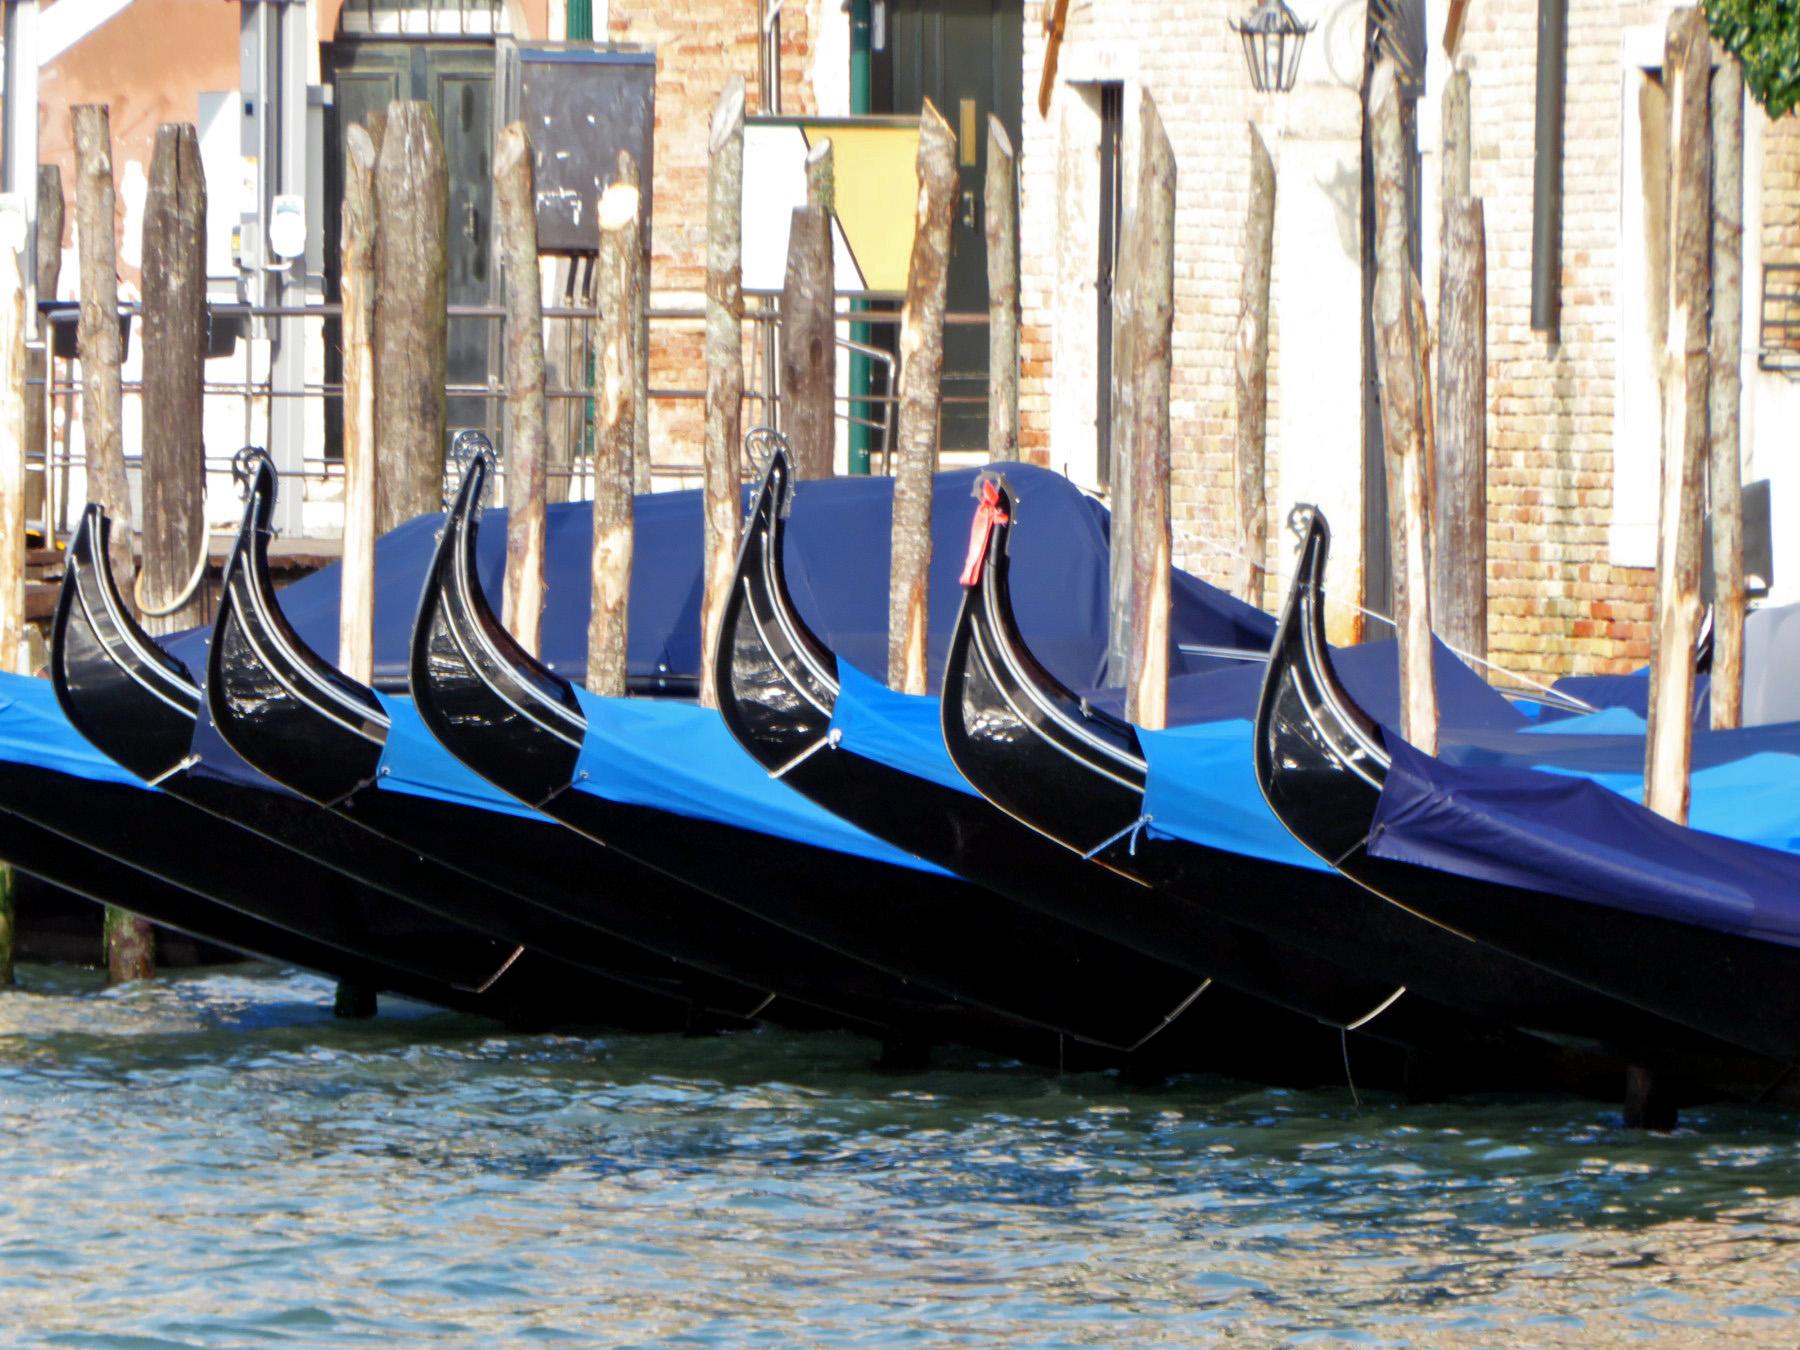 1b VN-DP-01 GF-08-Venezia